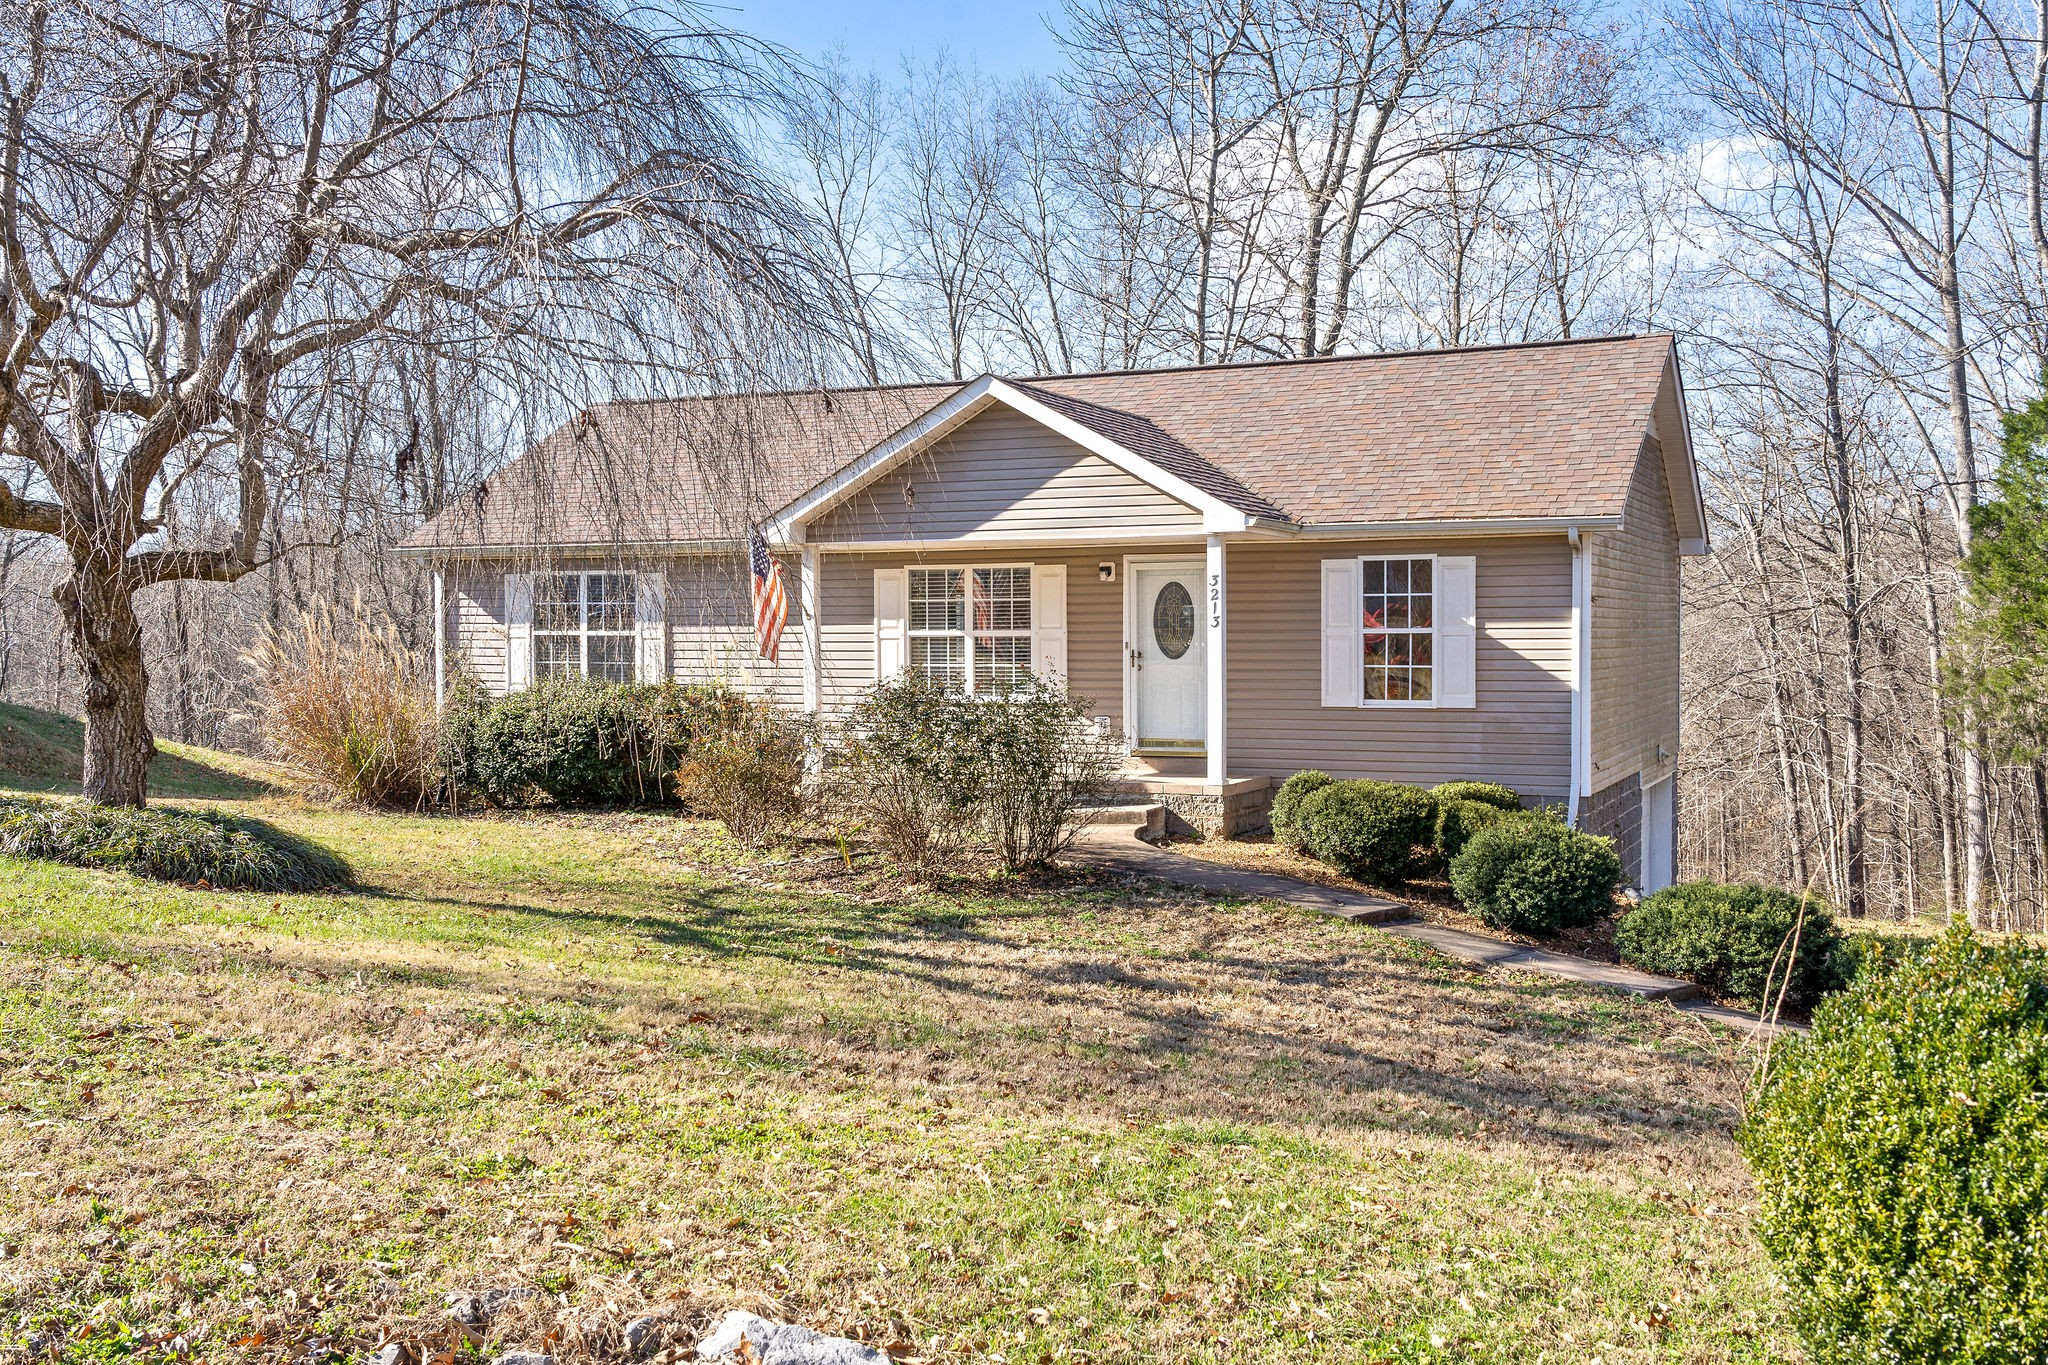 3213 Backridge Rd Property Photo - Woodlawn, TN real estate listing